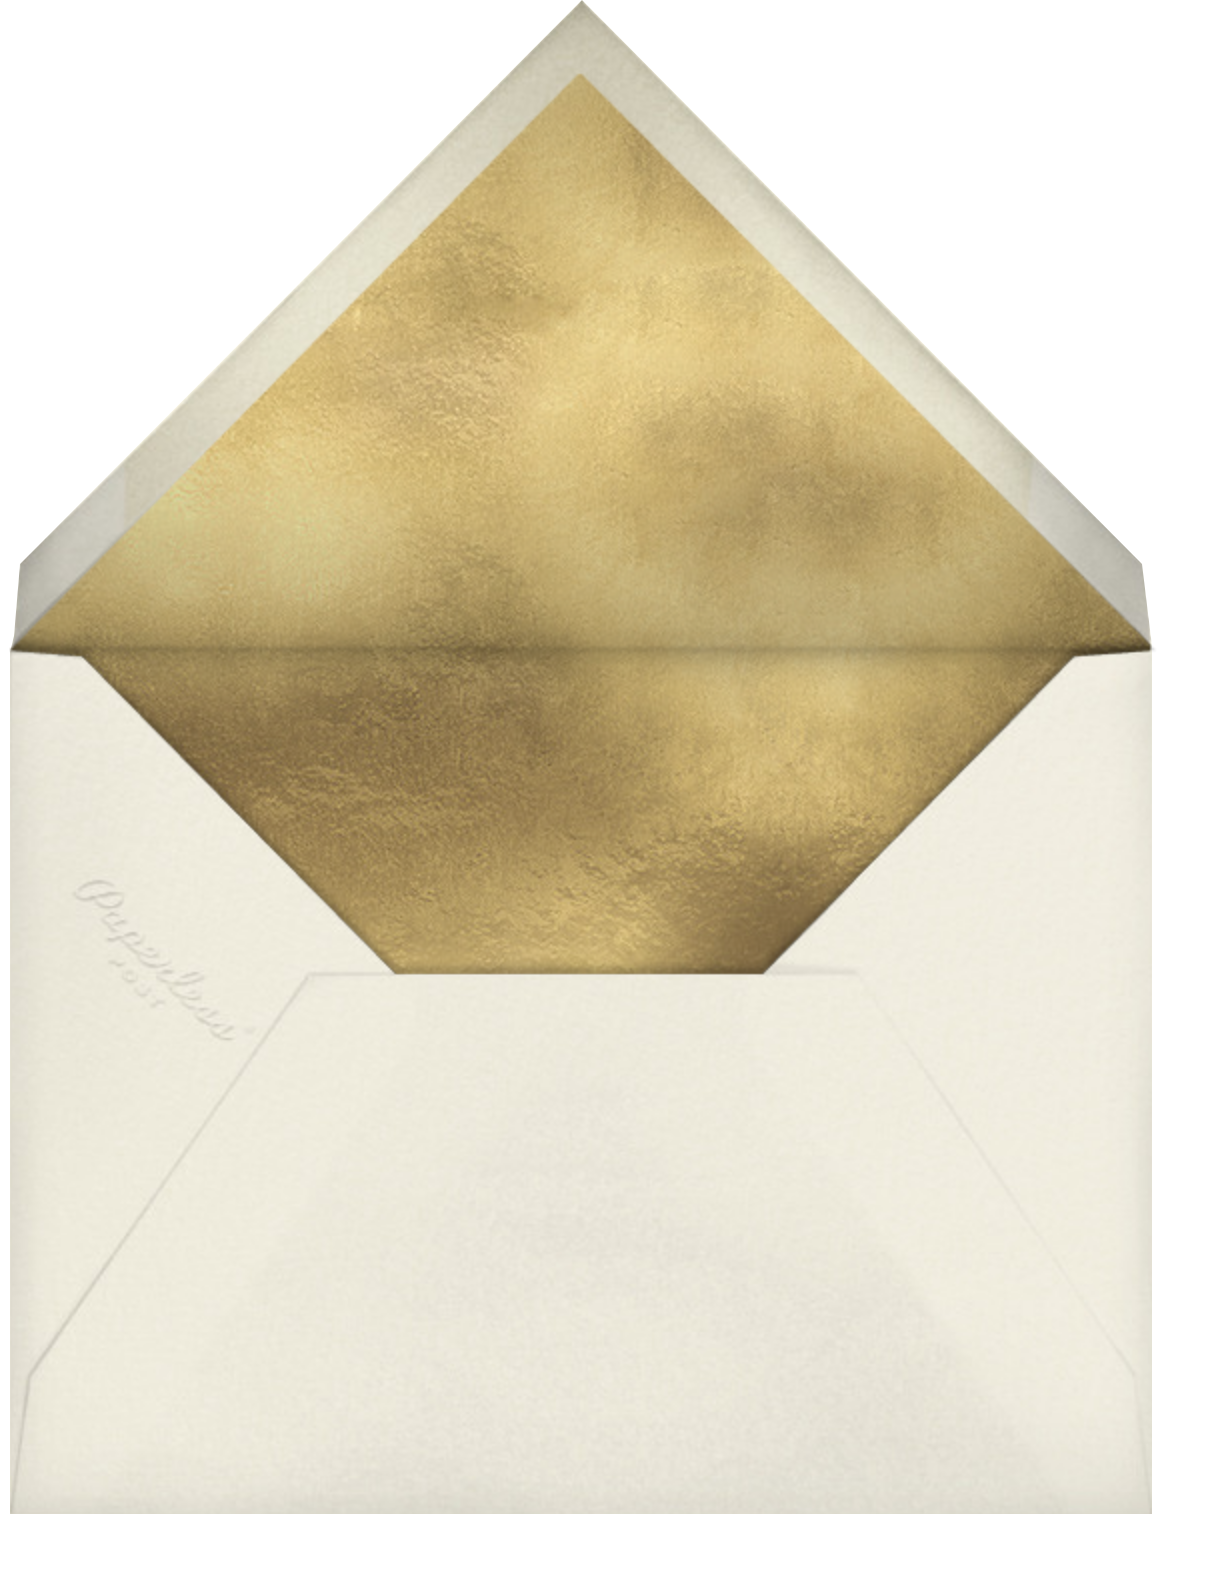 Climbing Hearts - Hydrangea - kate spade new york - Bachelorette party - envelope back